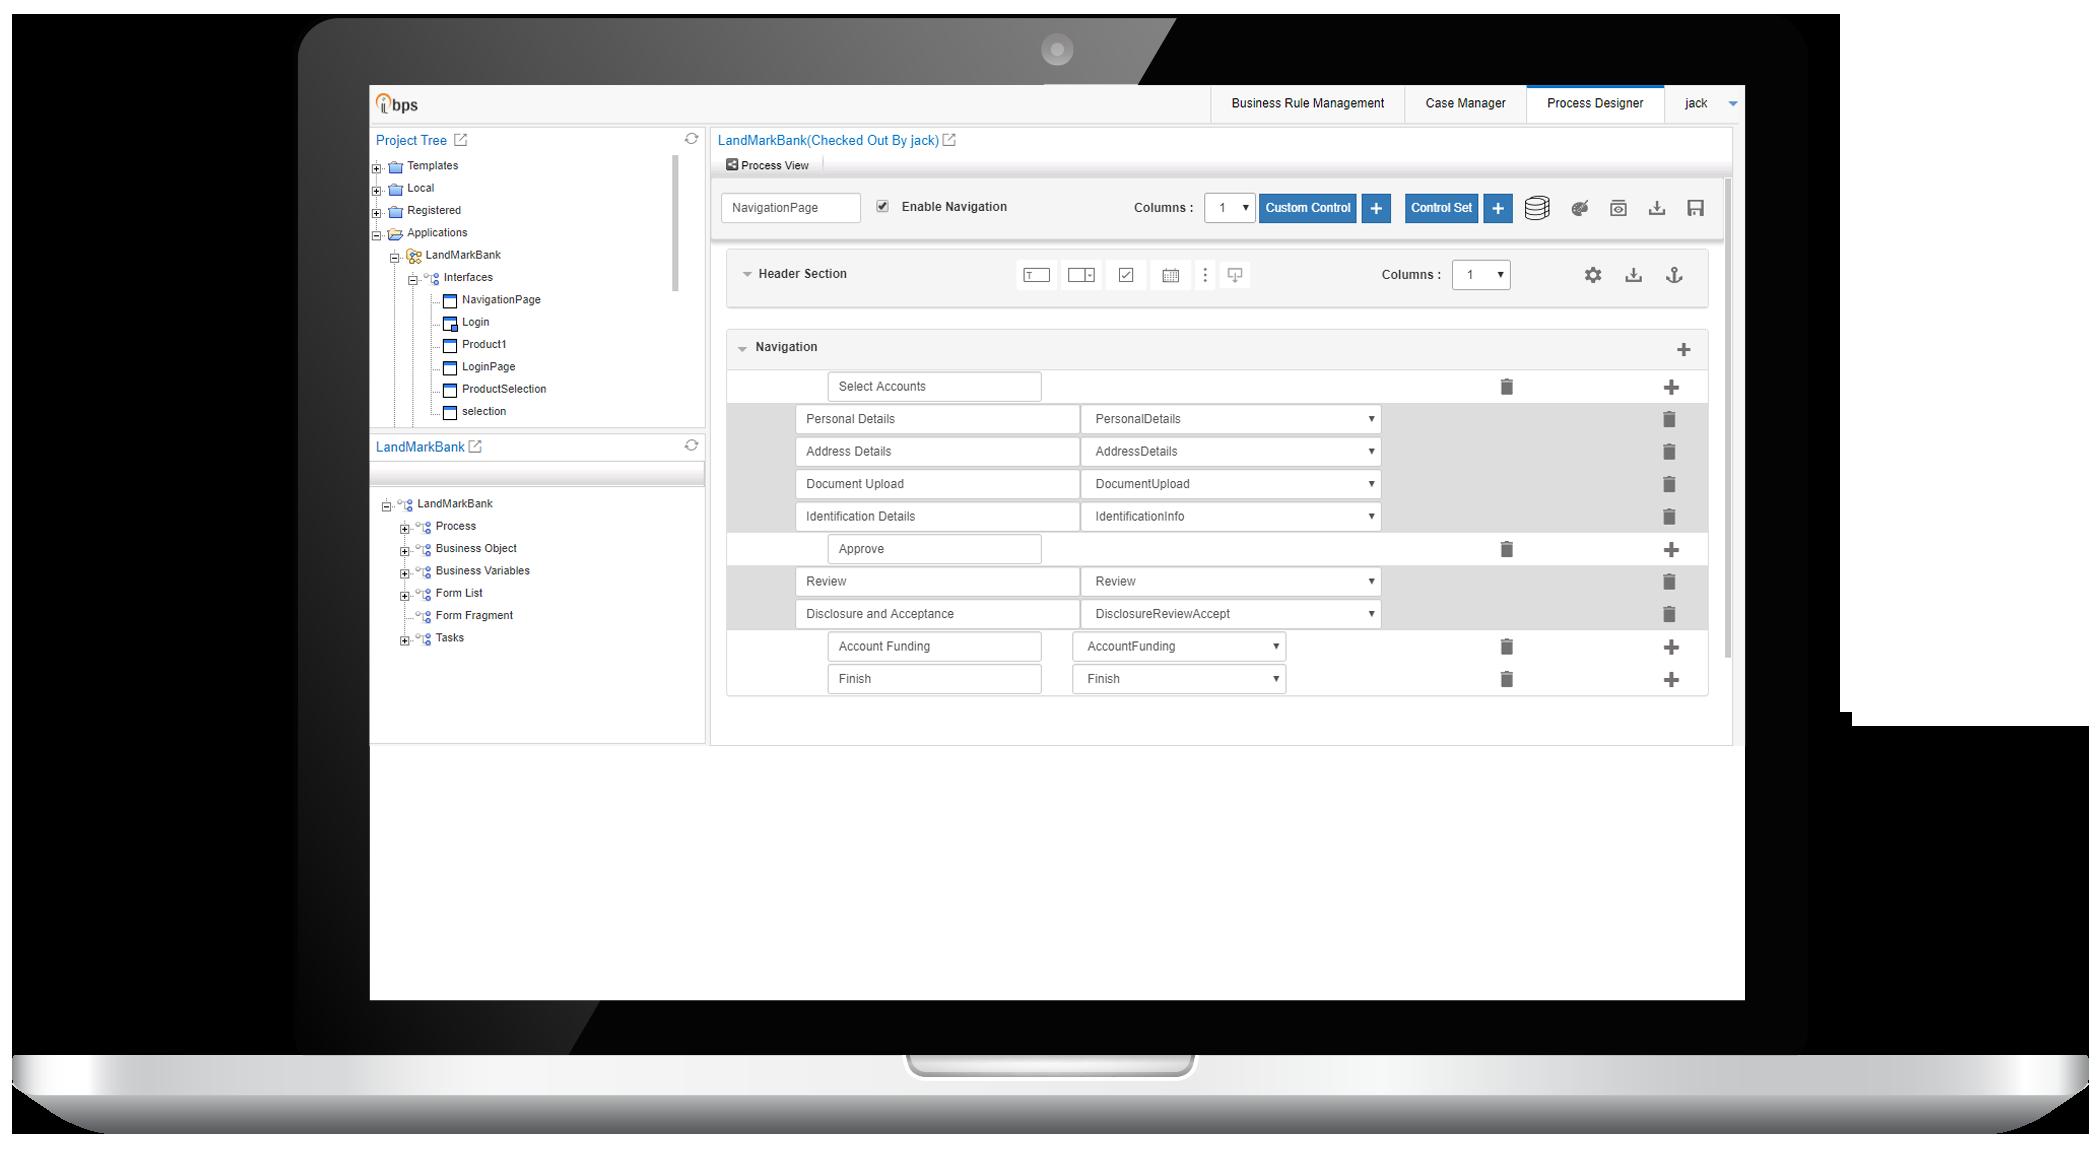 Low Code Application Development - Business Process Automation and Management (BPM)